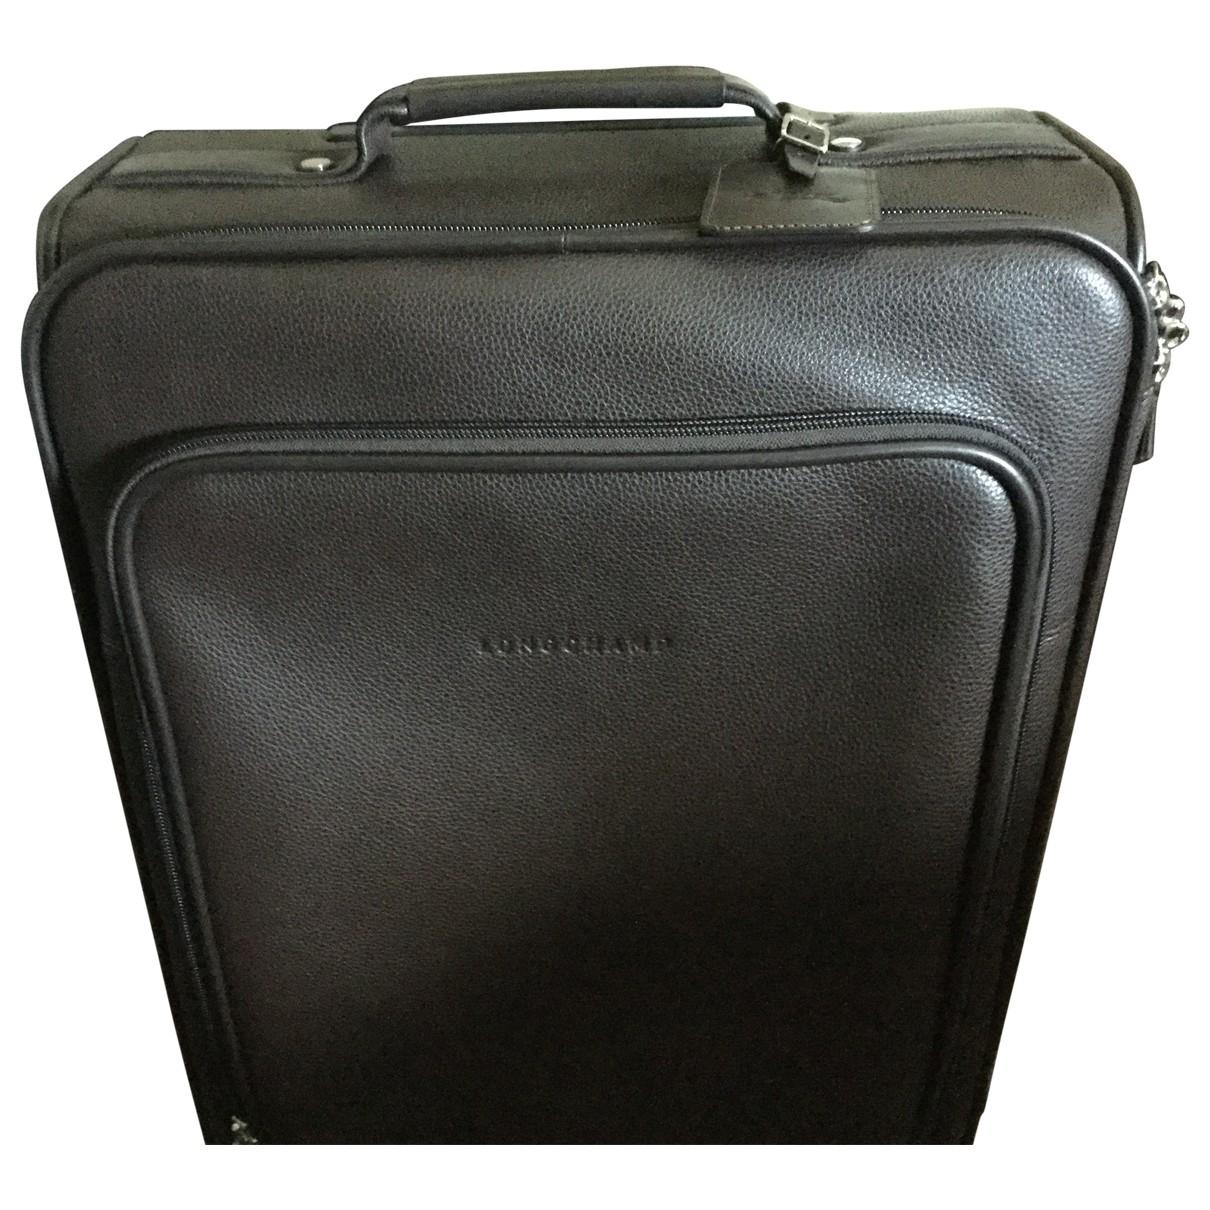 Longchamp \N Brown Leather Travel bag for Women \N